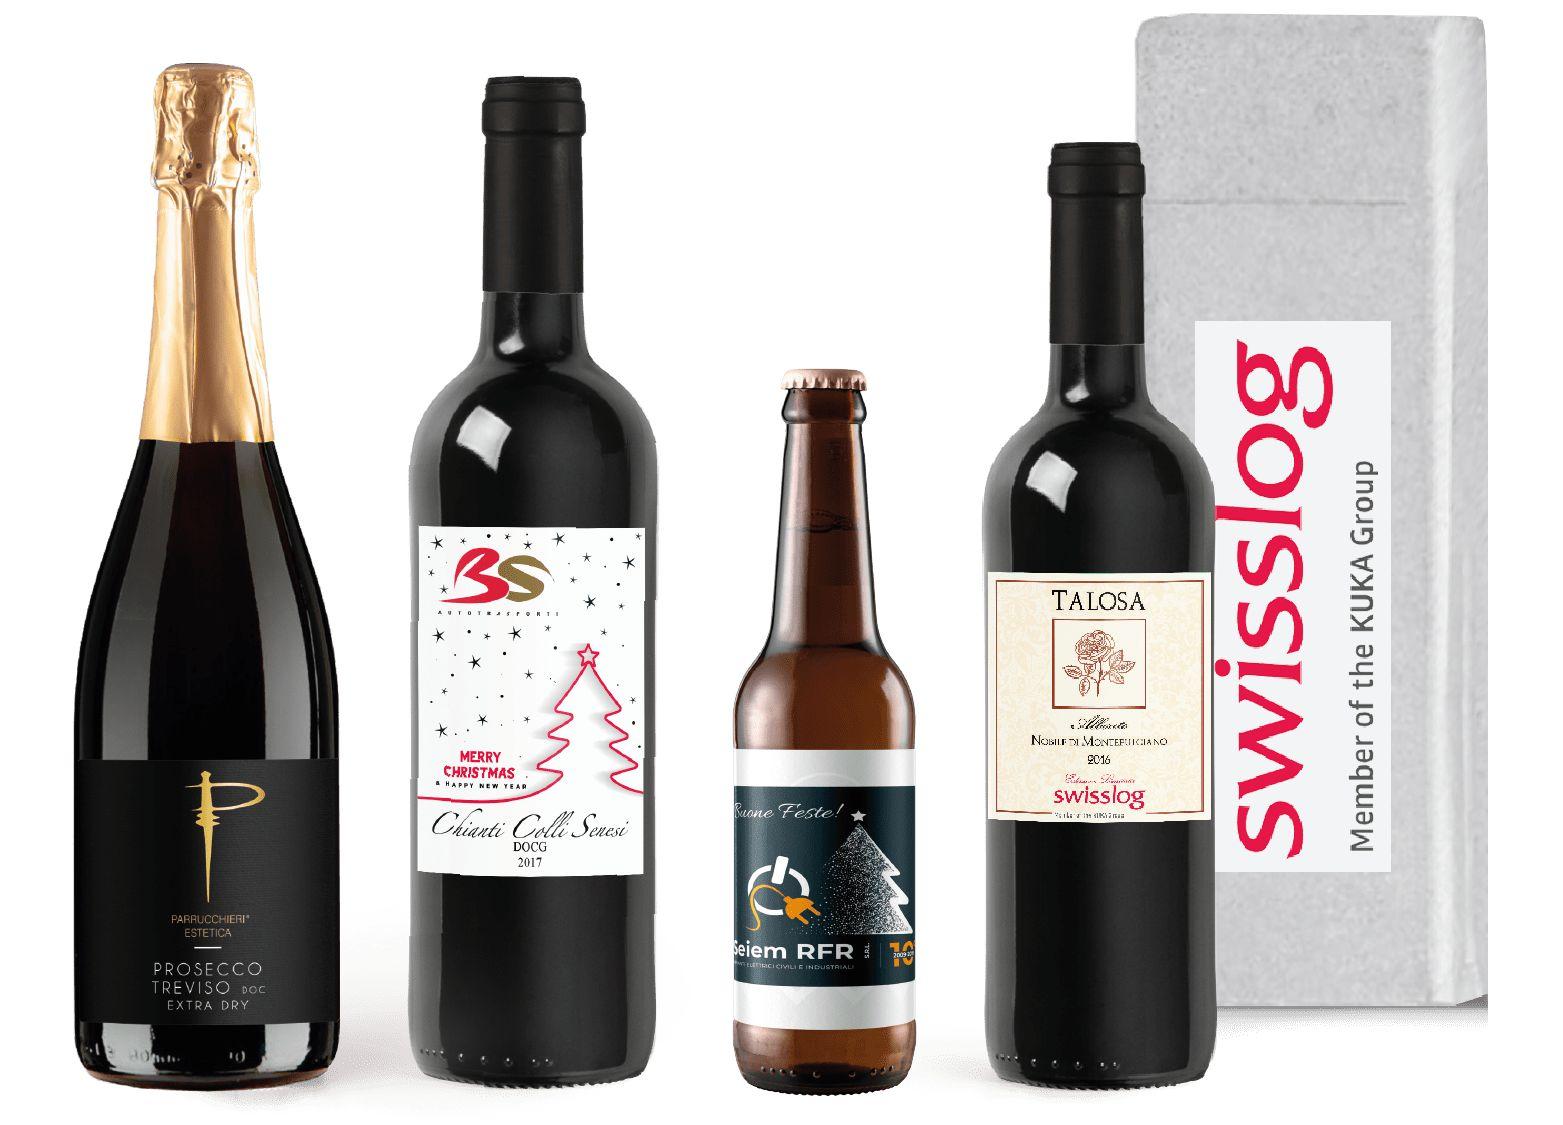 bottiglie personalizzate strenne natalizie aziendali